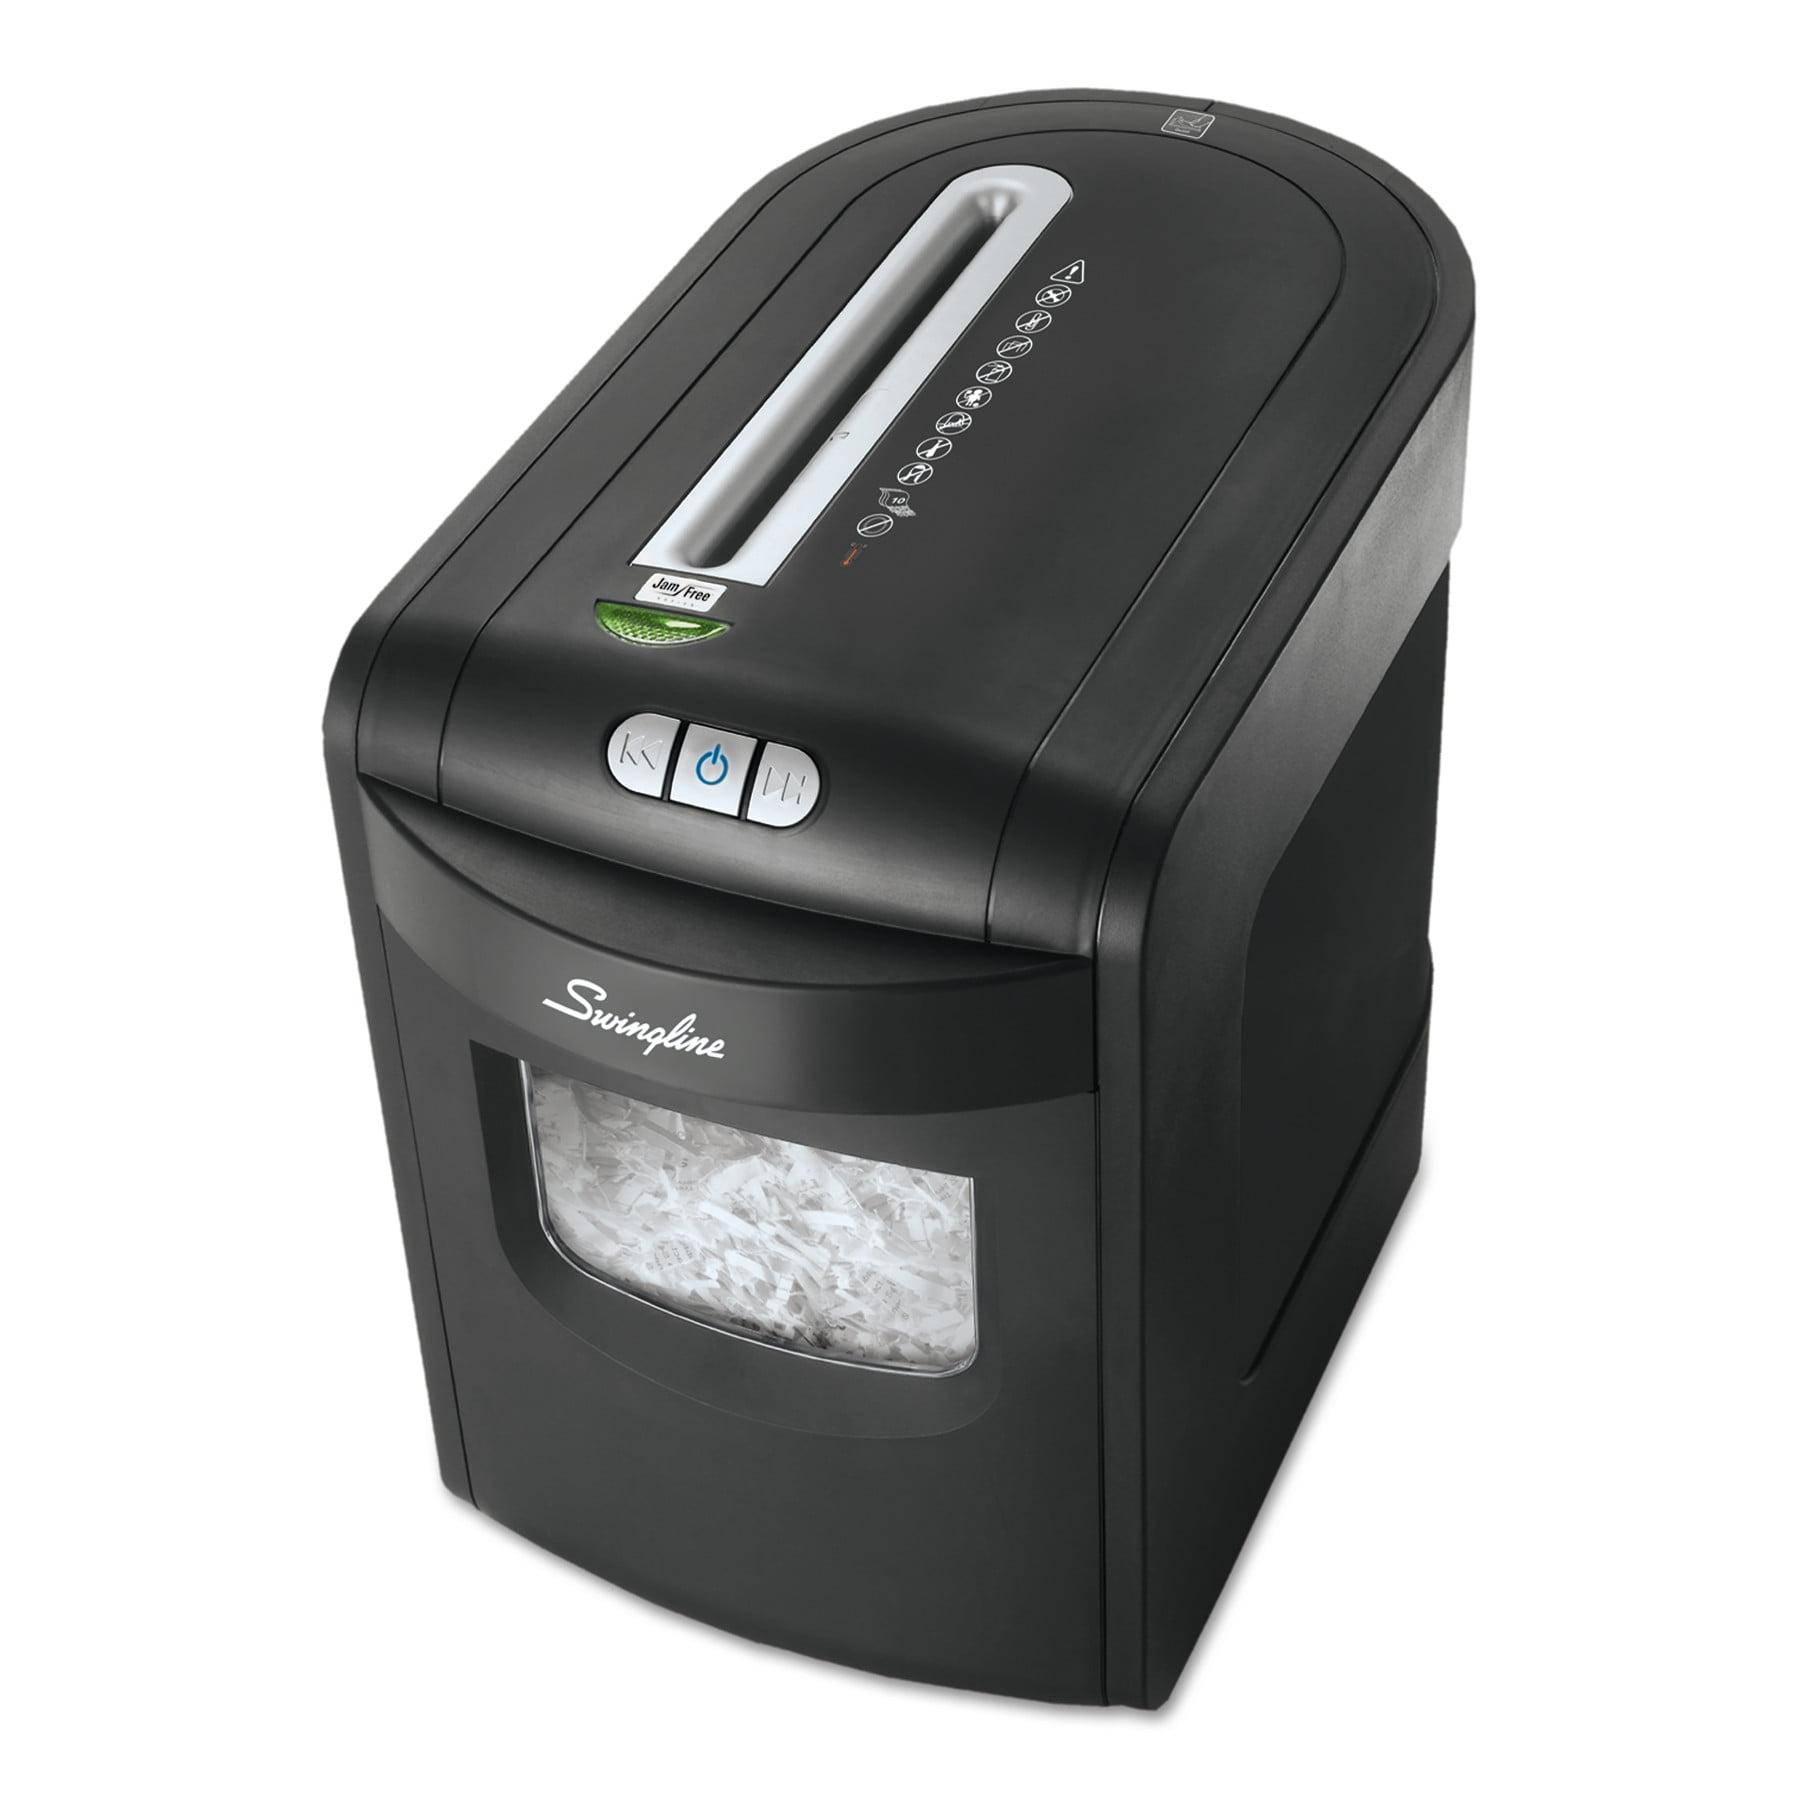 Swingline EM07-06 Micro-Cut Jam Free Shredder, 7 Sheets, 1-2 Users